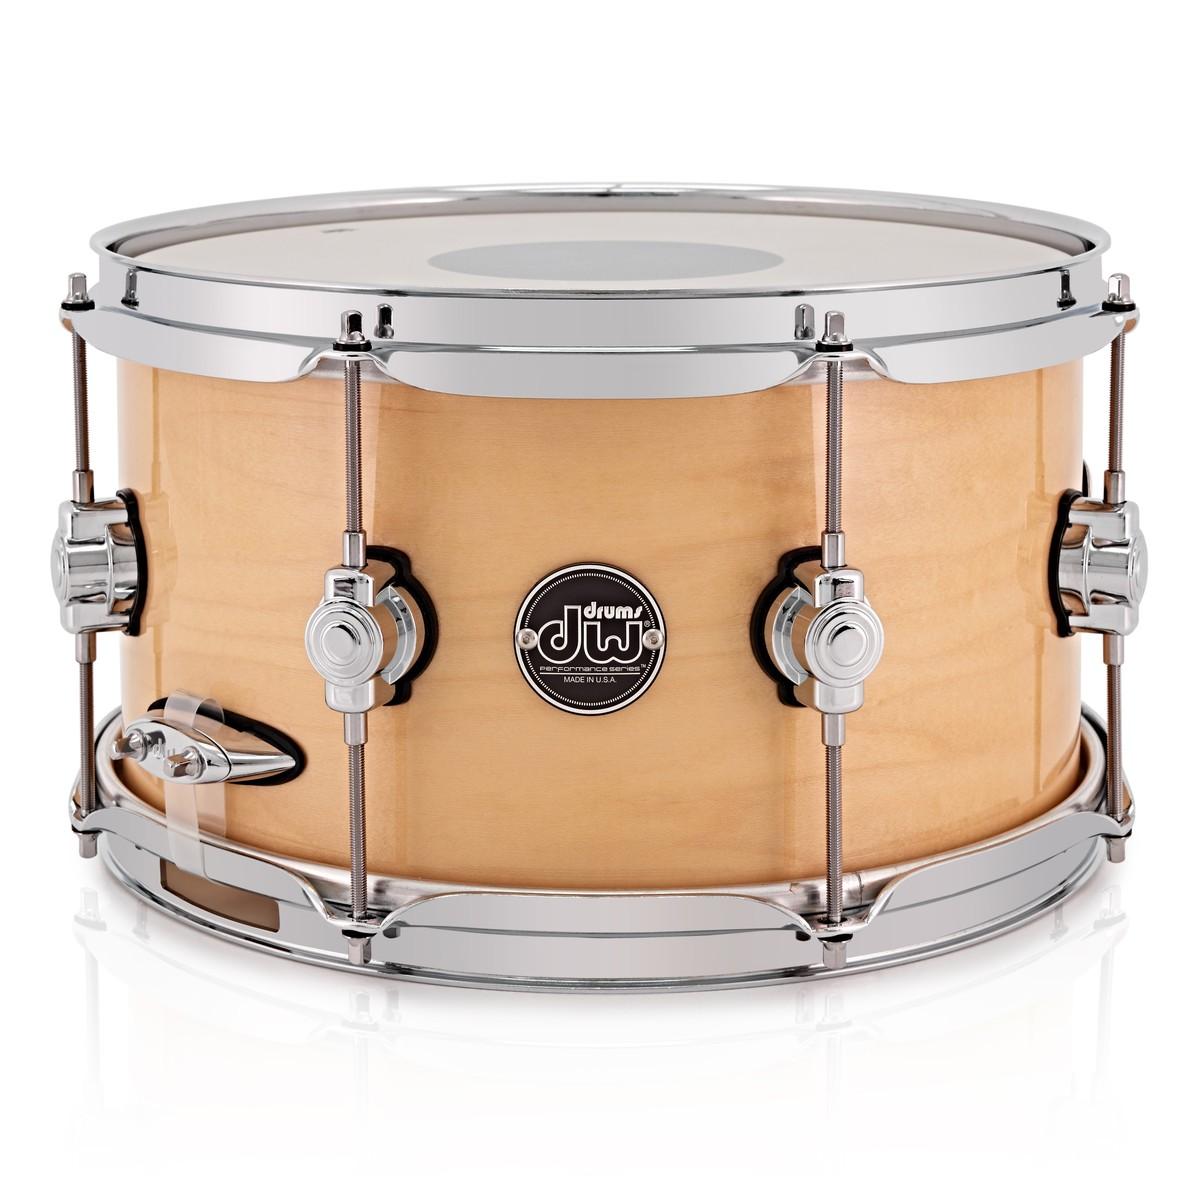 dw drums performance series 13 x 7 snare drum natural at. Black Bedroom Furniture Sets. Home Design Ideas